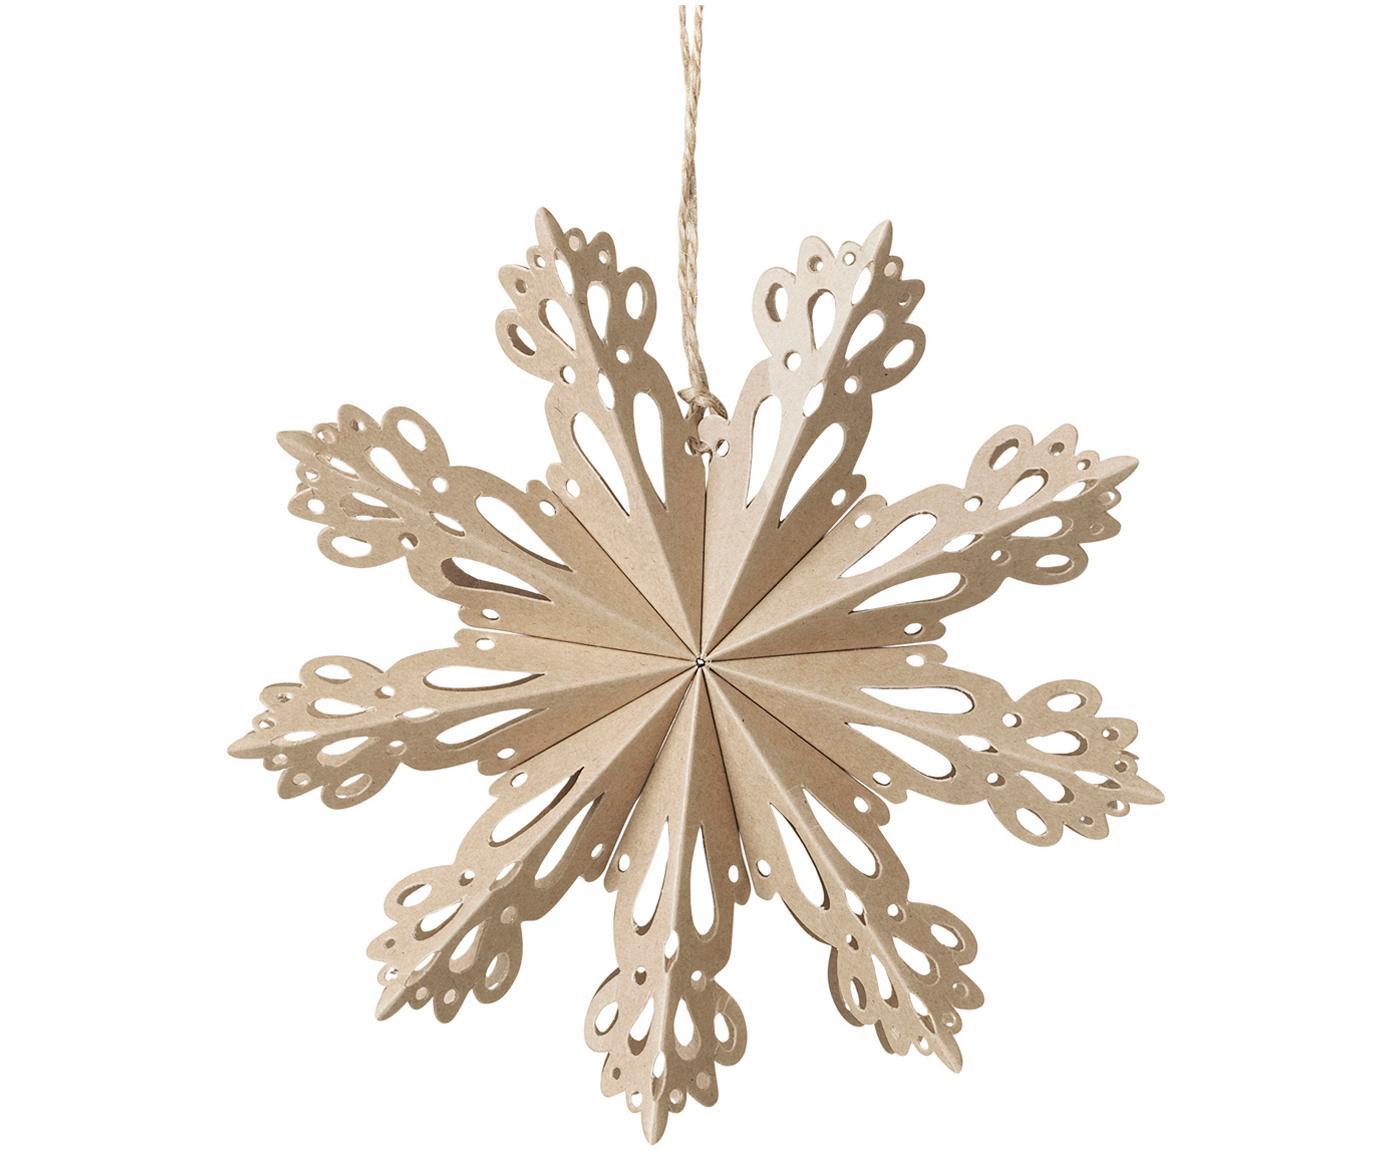 XL-kerstboomhanger Snowflake, Papier, Beige, Ø 15 cm